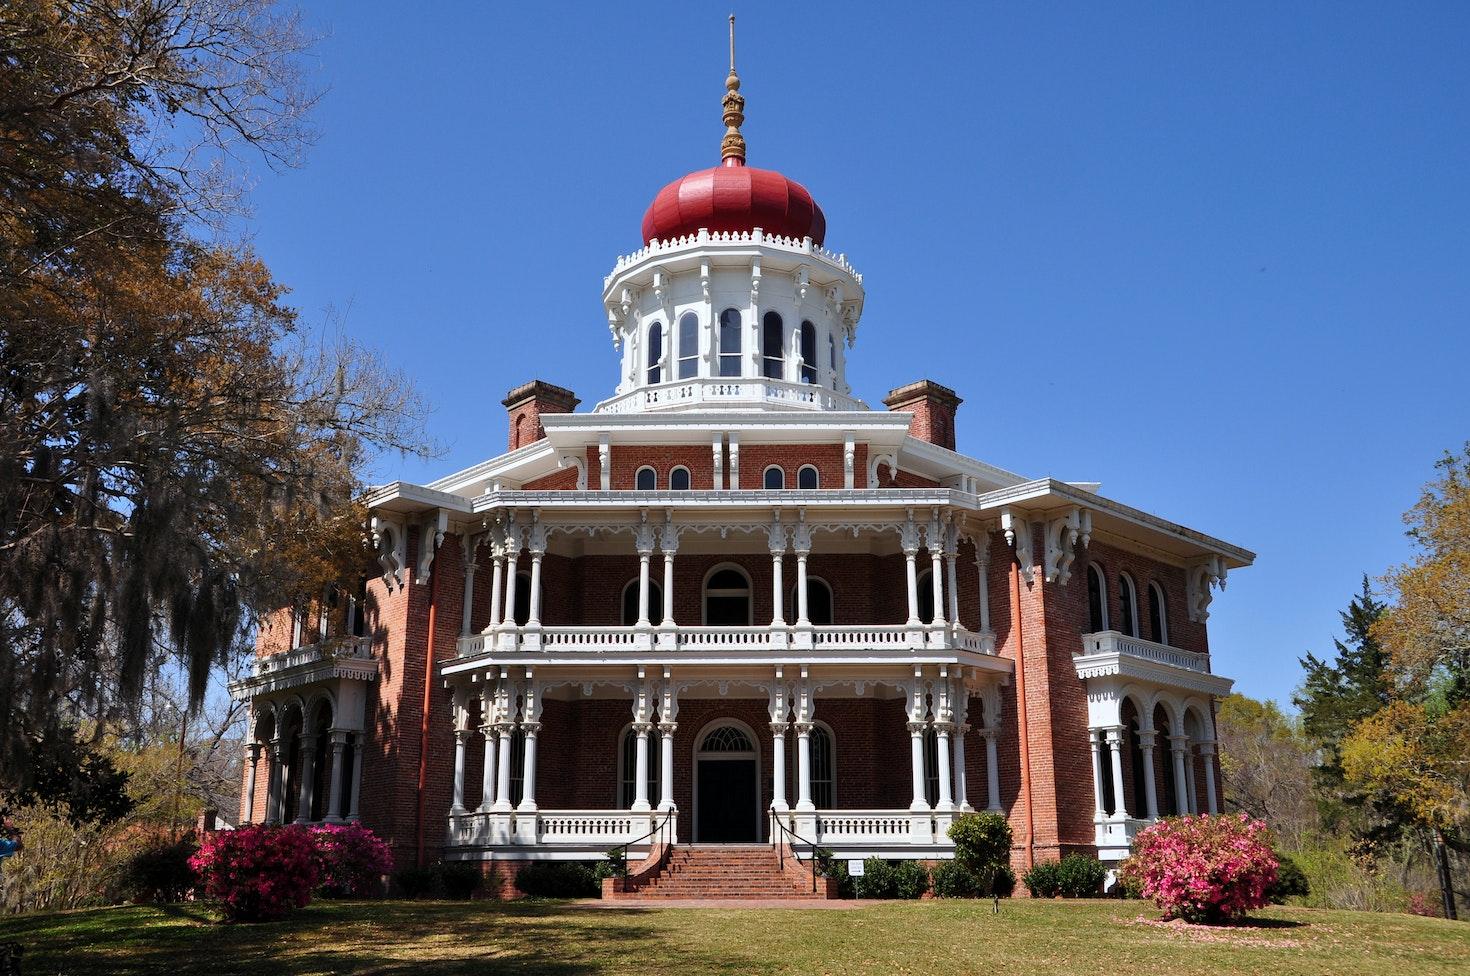 Longwood, the historic antebellum octagonal mansion  Natchez, Mississippi © Helmut-Krass / 500px